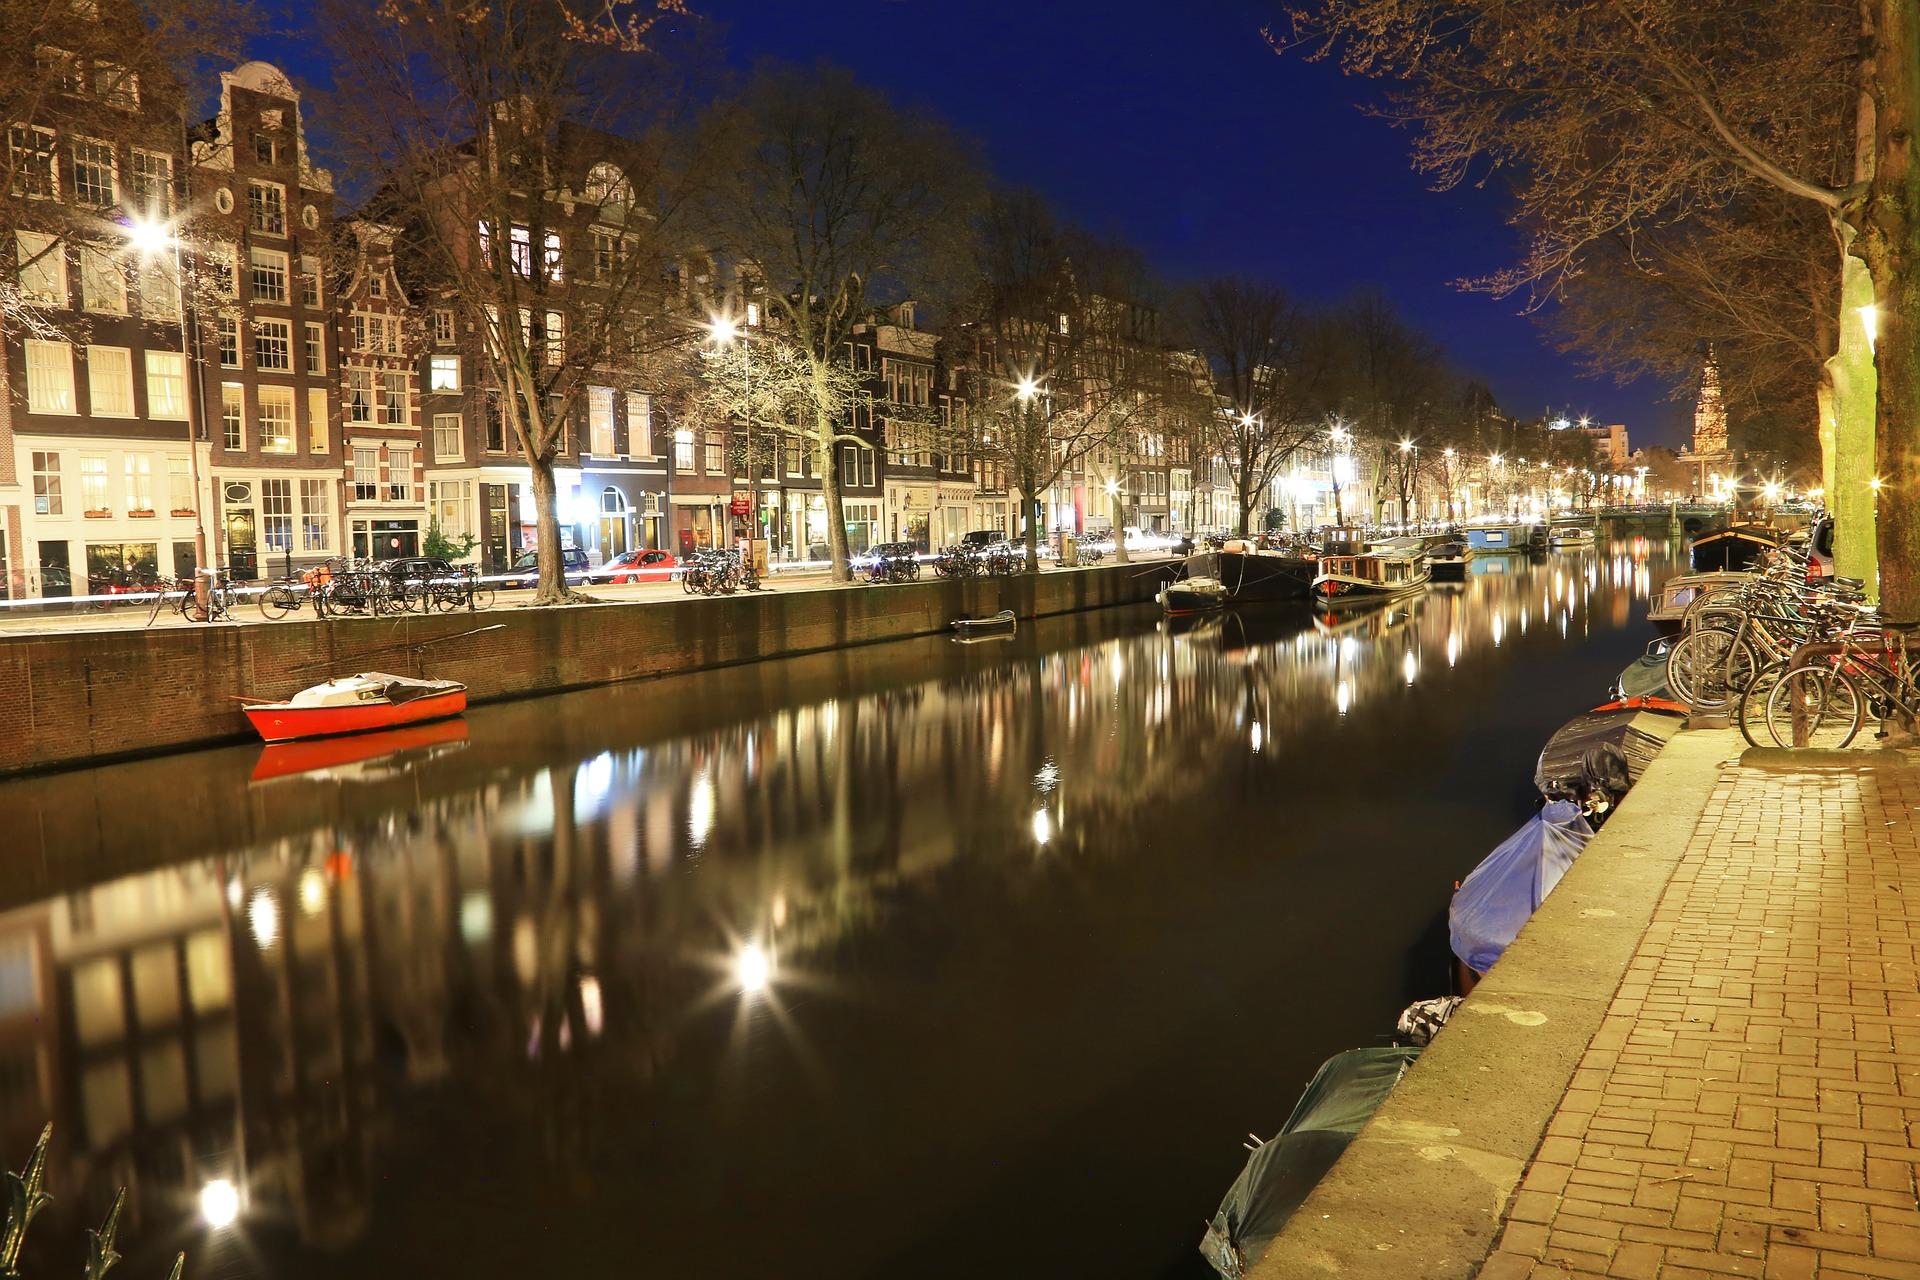 amsterdam-734235_1920.jpg